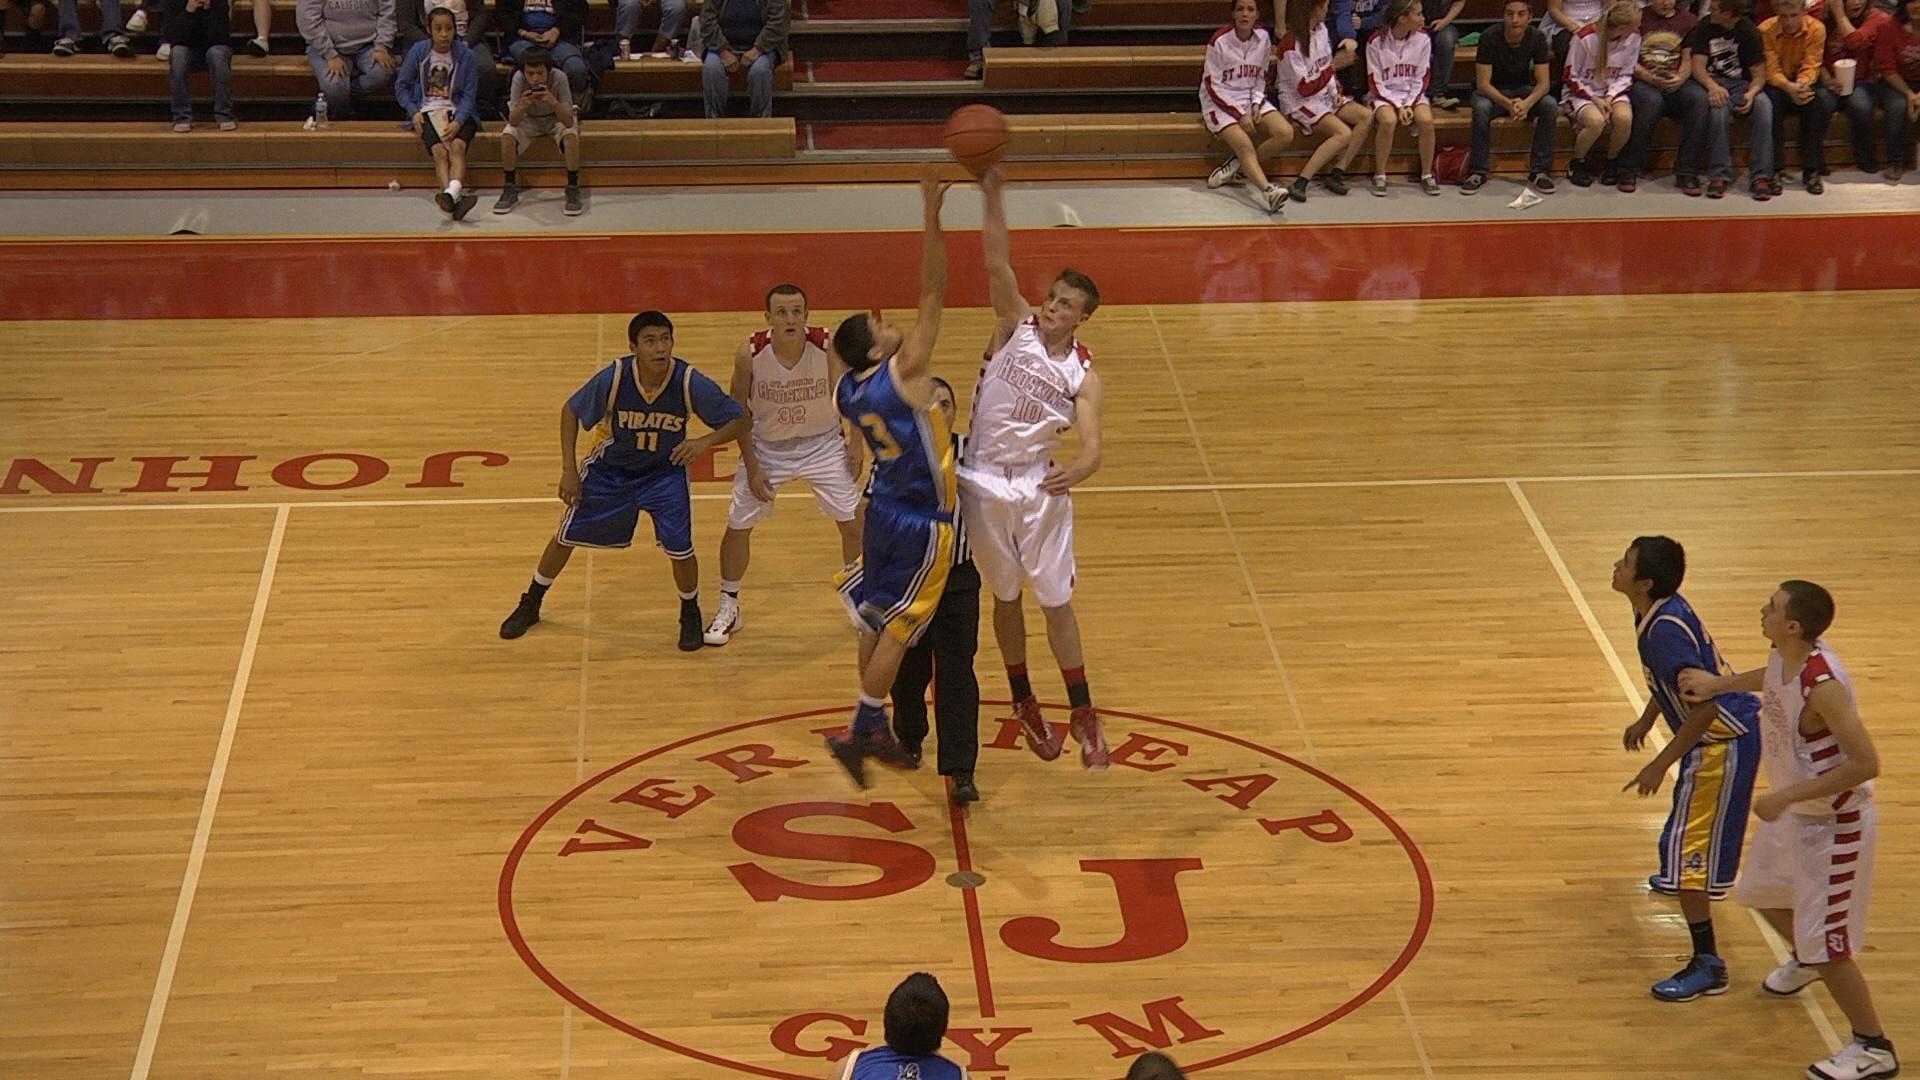 2012 Boys Basketball - Sanders Valley